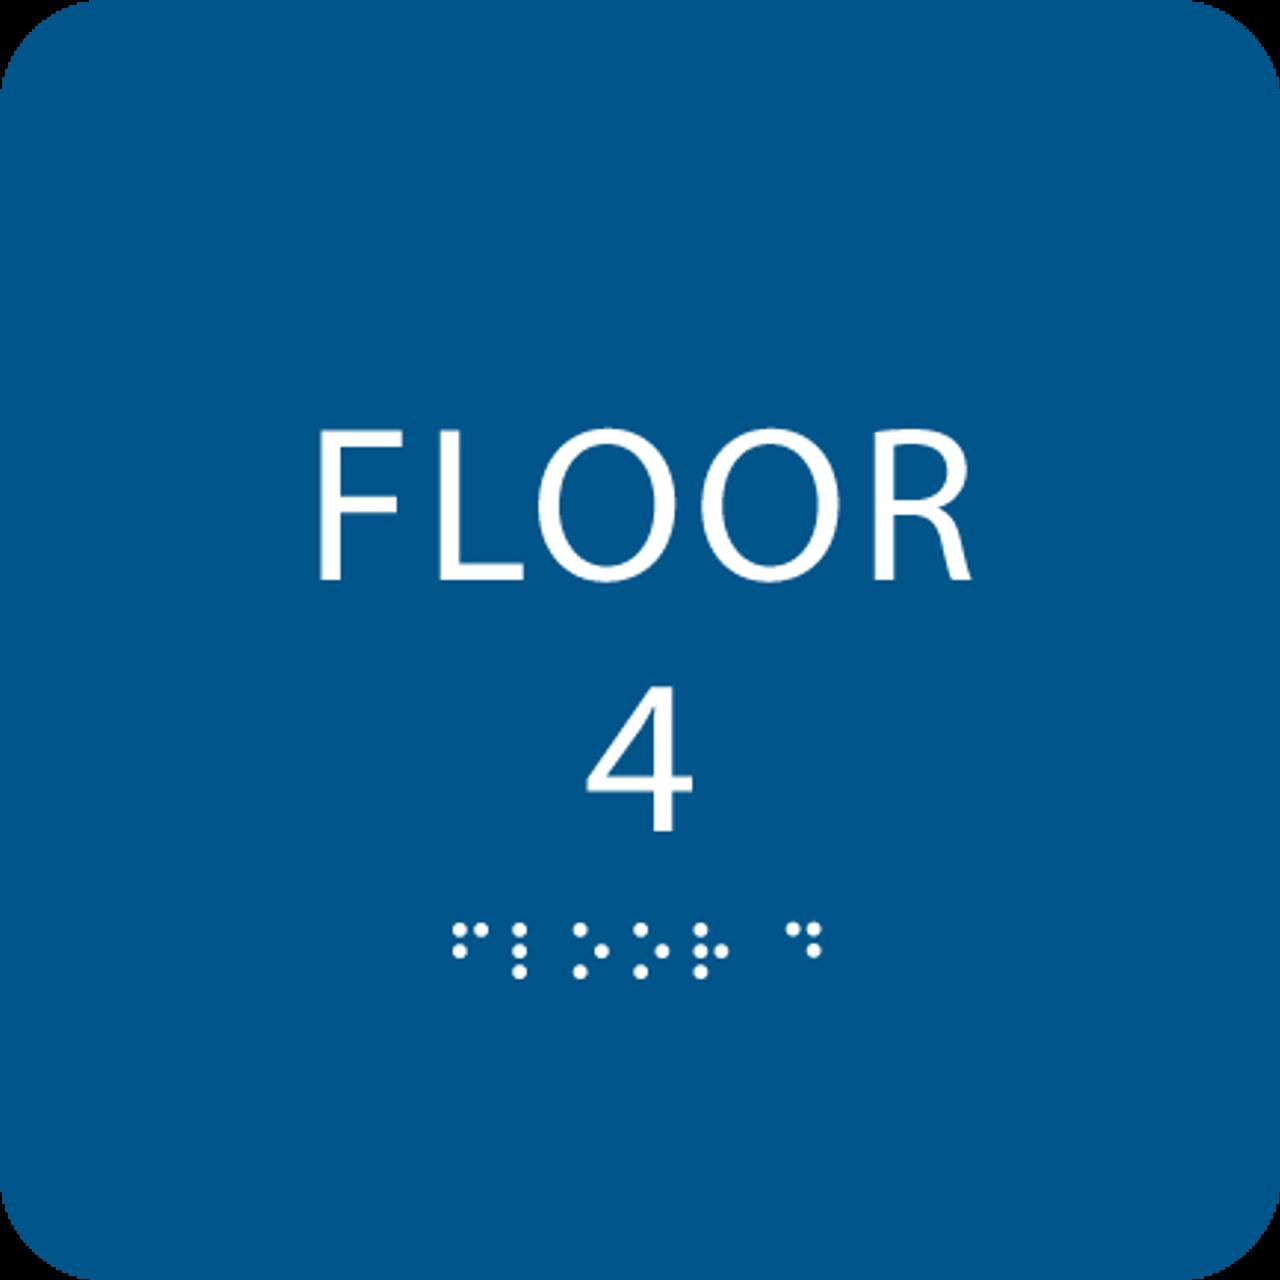 Blue Floor 4 Identification Sign